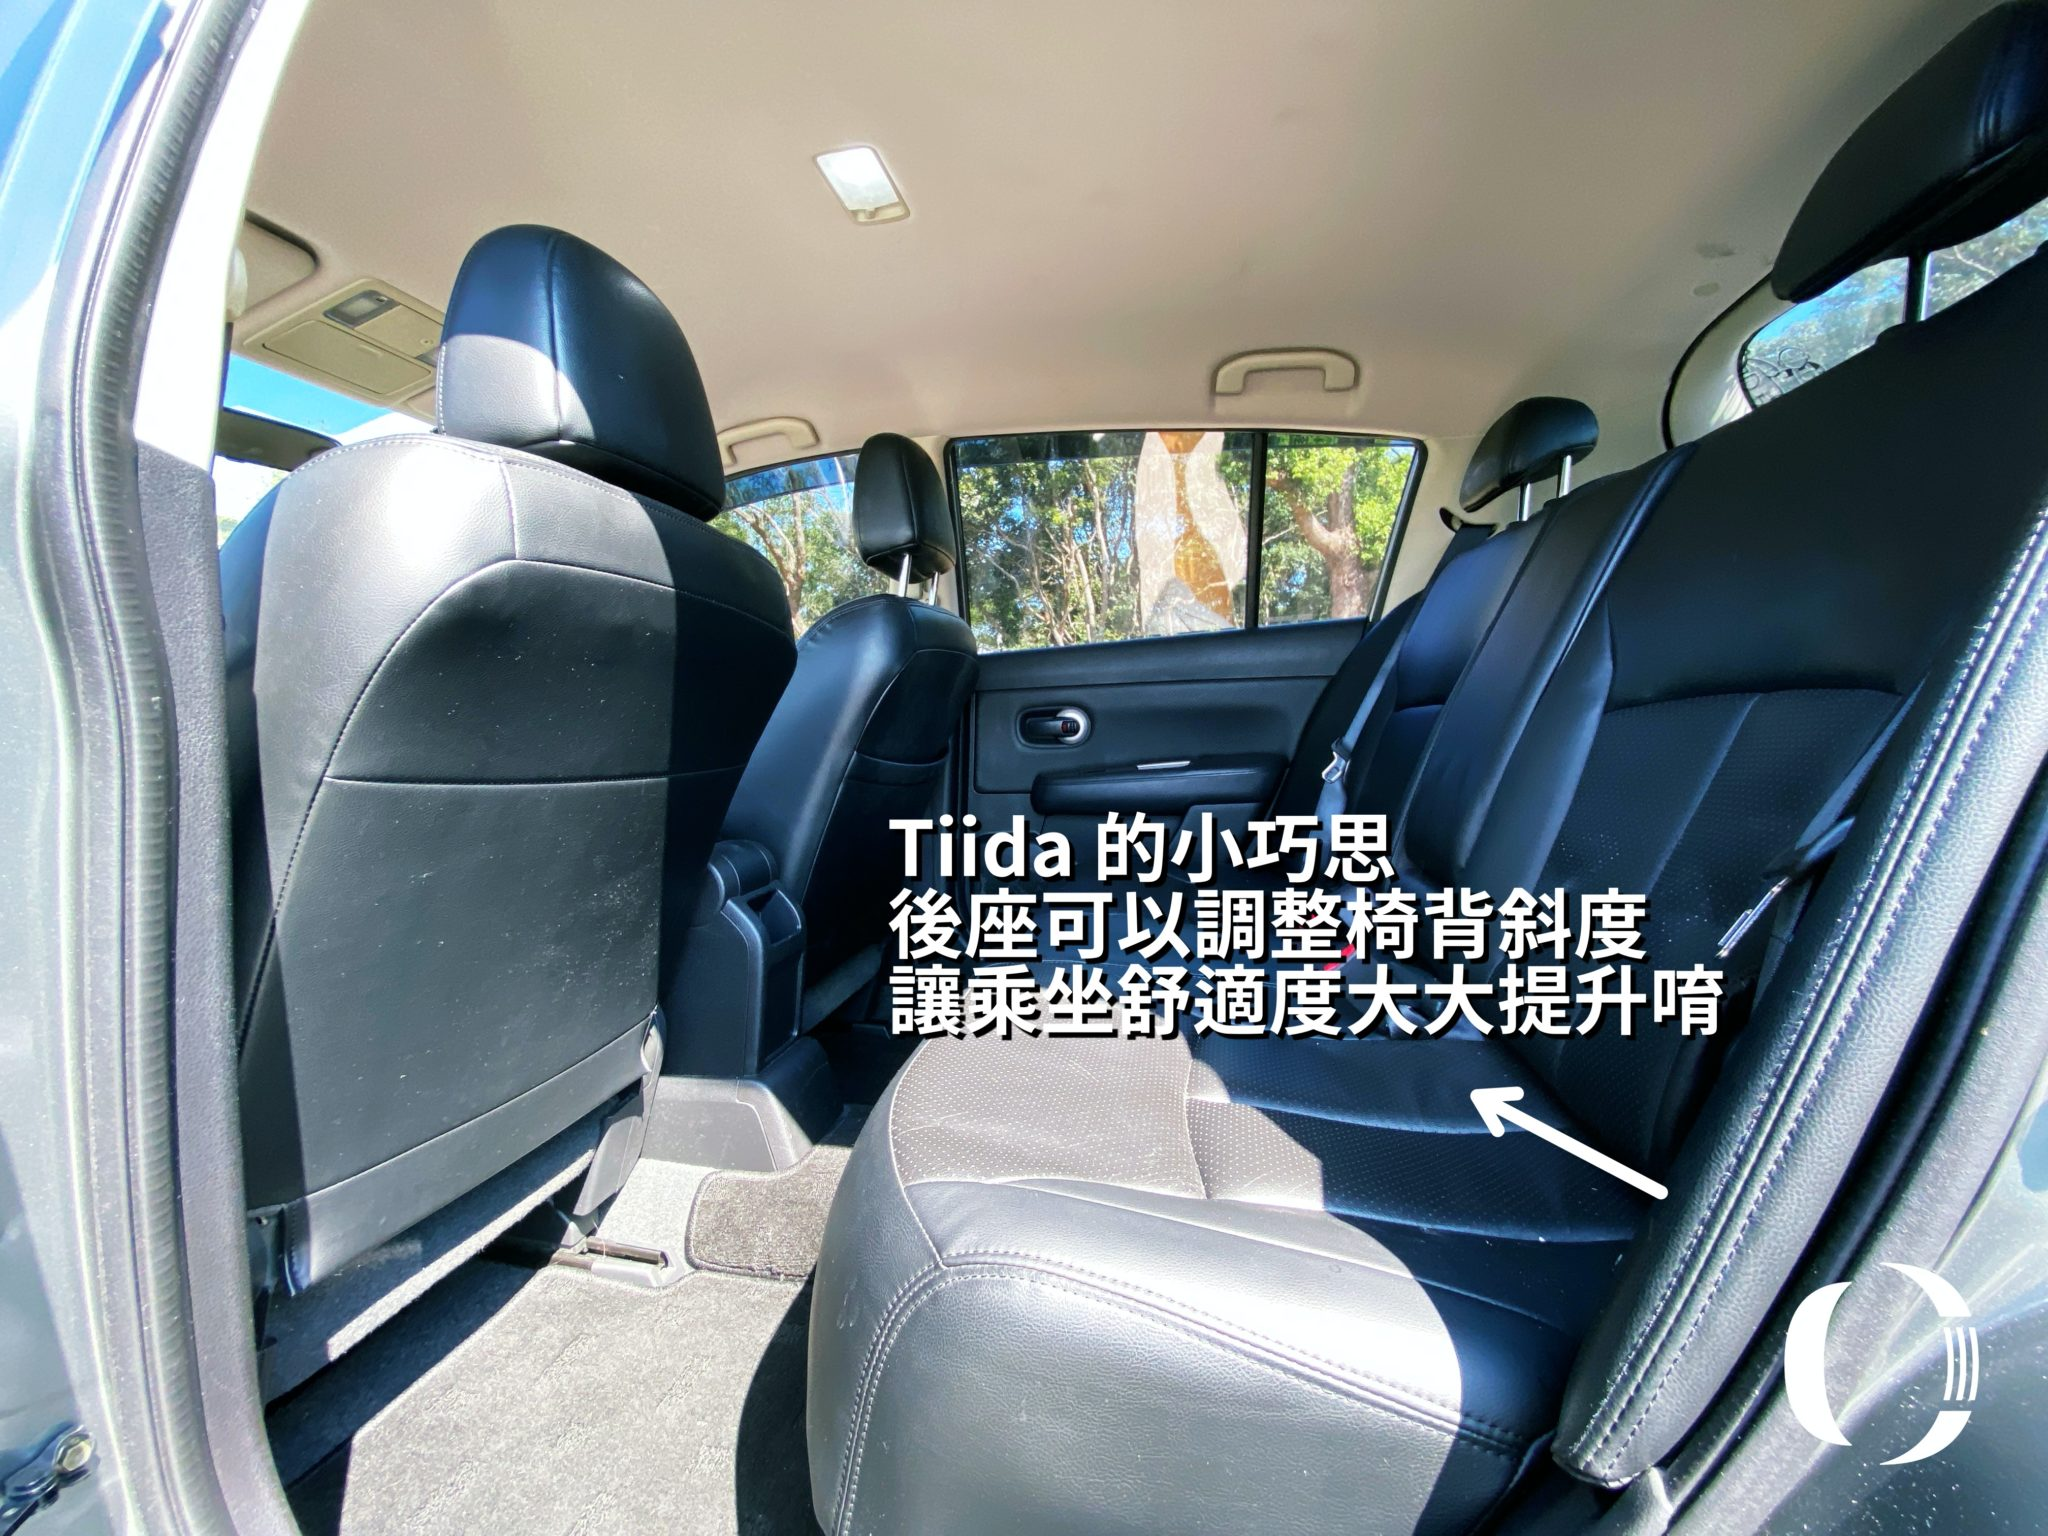 Nissan,Tiida,中古車推薦,安心中古車,買二手車,小車大空間